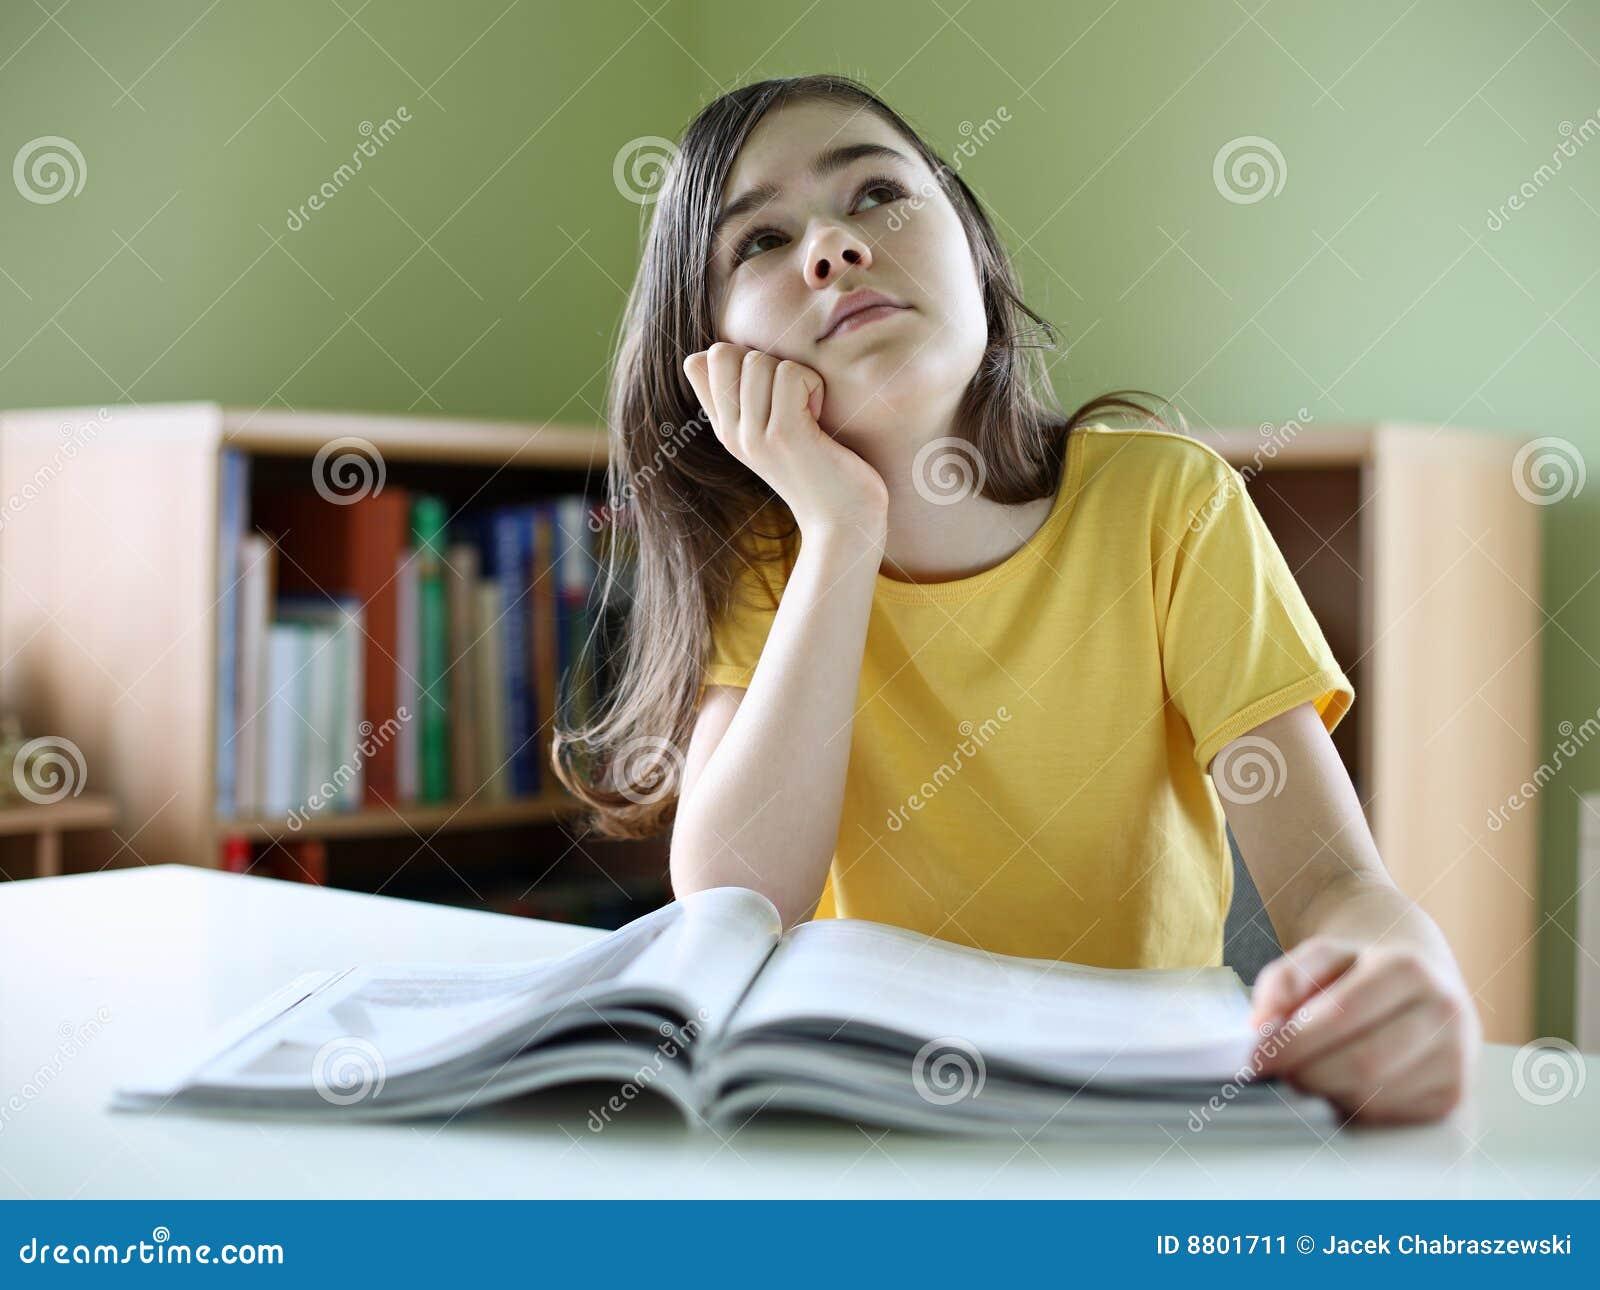 Girl reading magazines